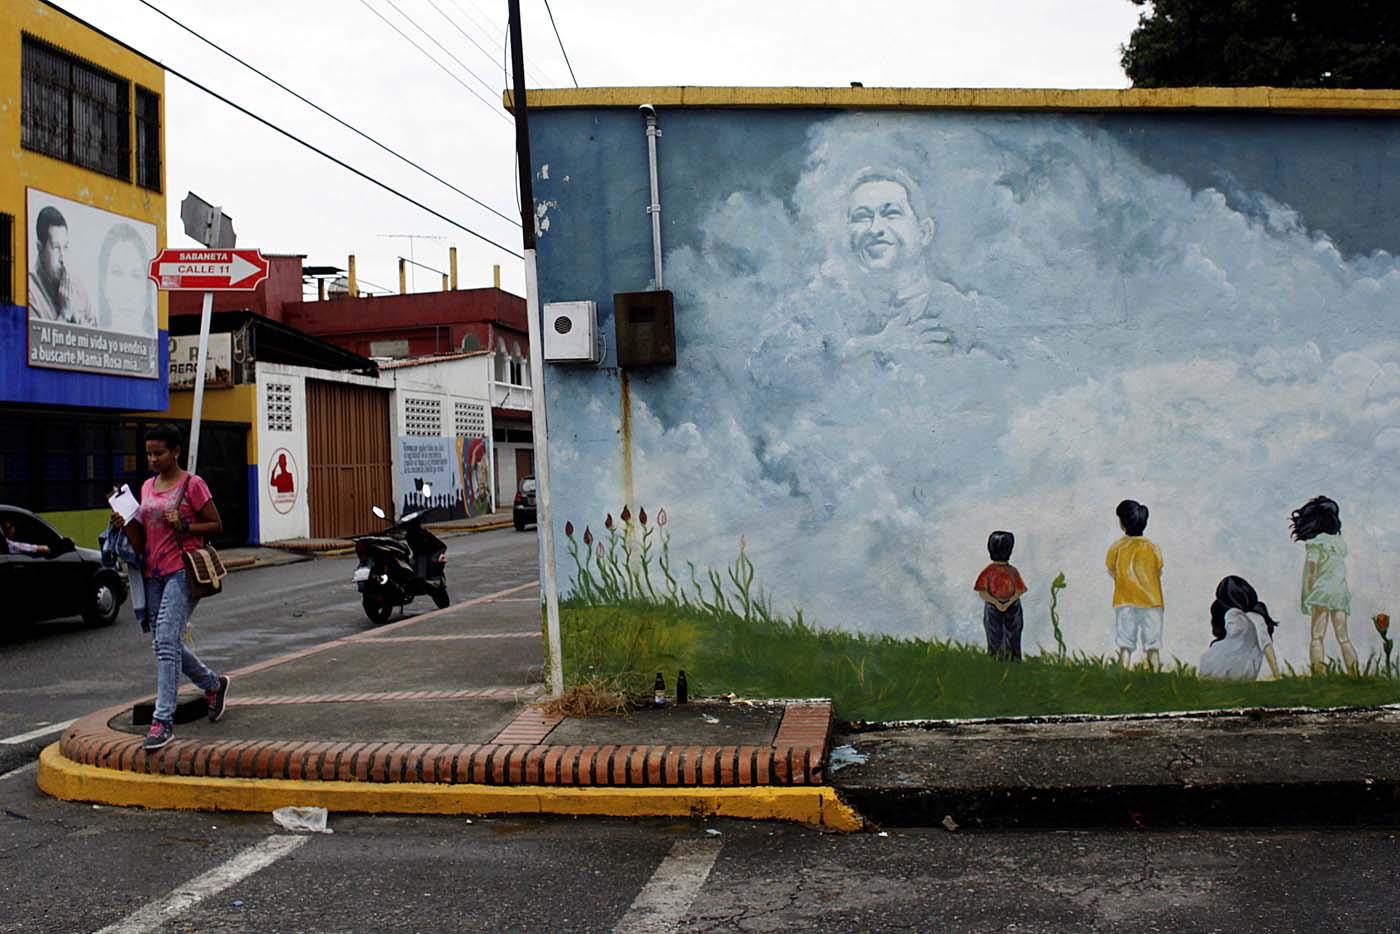 A woman walks past a mural depicting Venezuela's late President Hugo Chavez in Sabaneta, Venezuela June 13, 2017. Picture taken June 13, 2017. REUTERS/Carlos Eduardo Ramirez